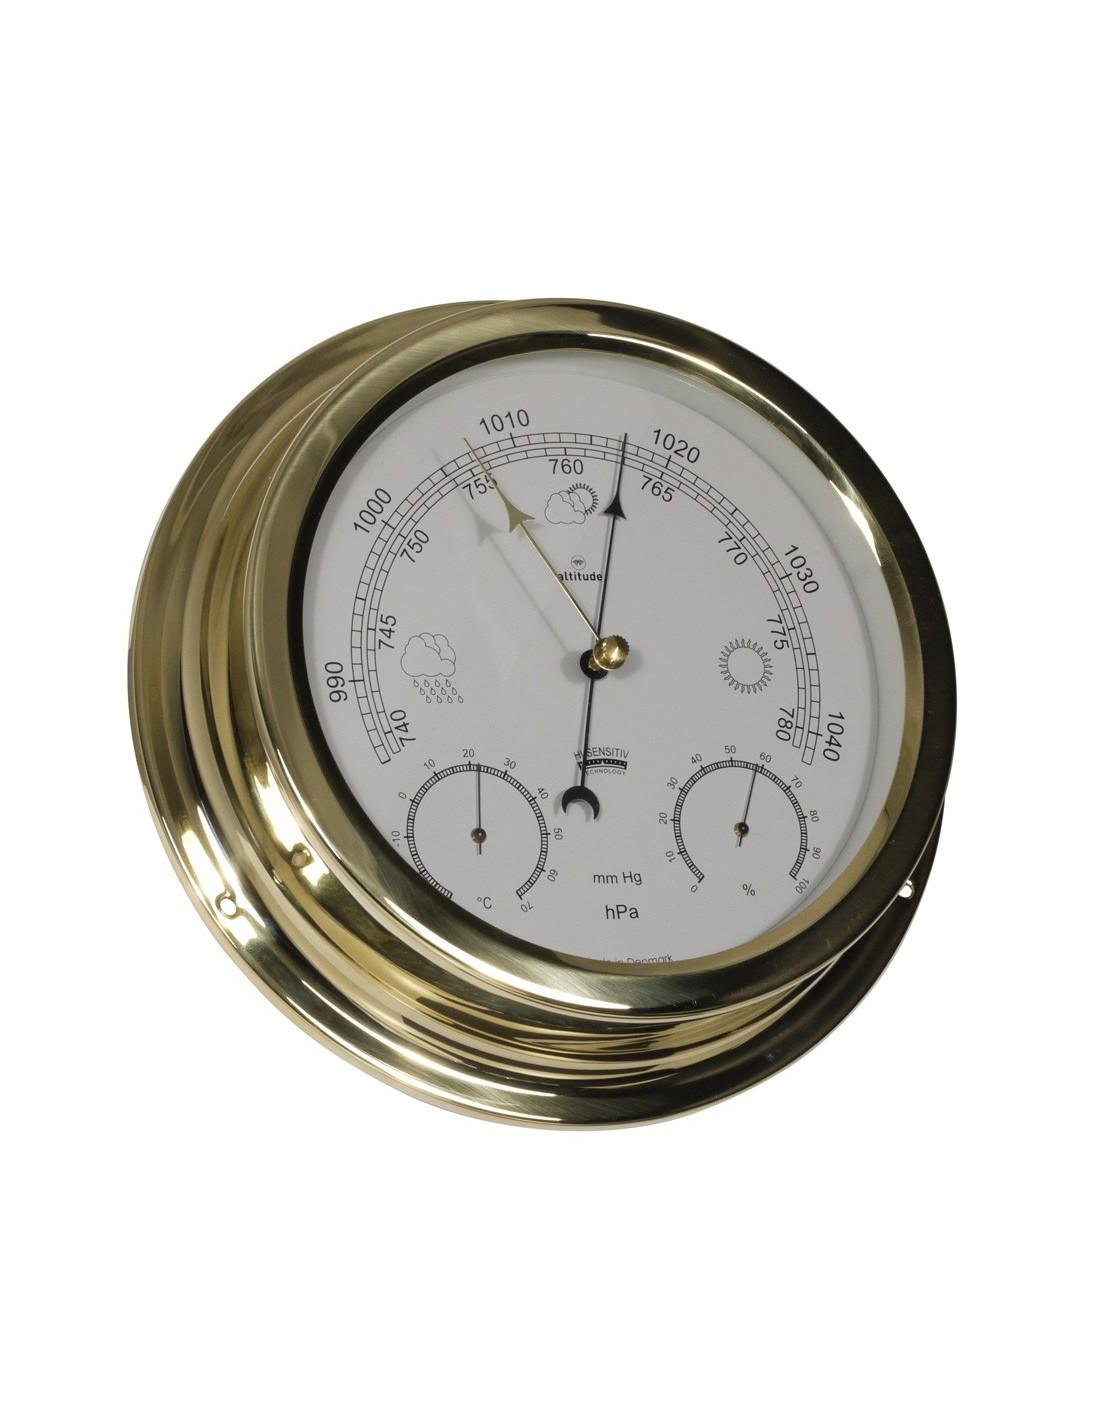 Barometer / Thermometer / Hygrometer - 224 mm